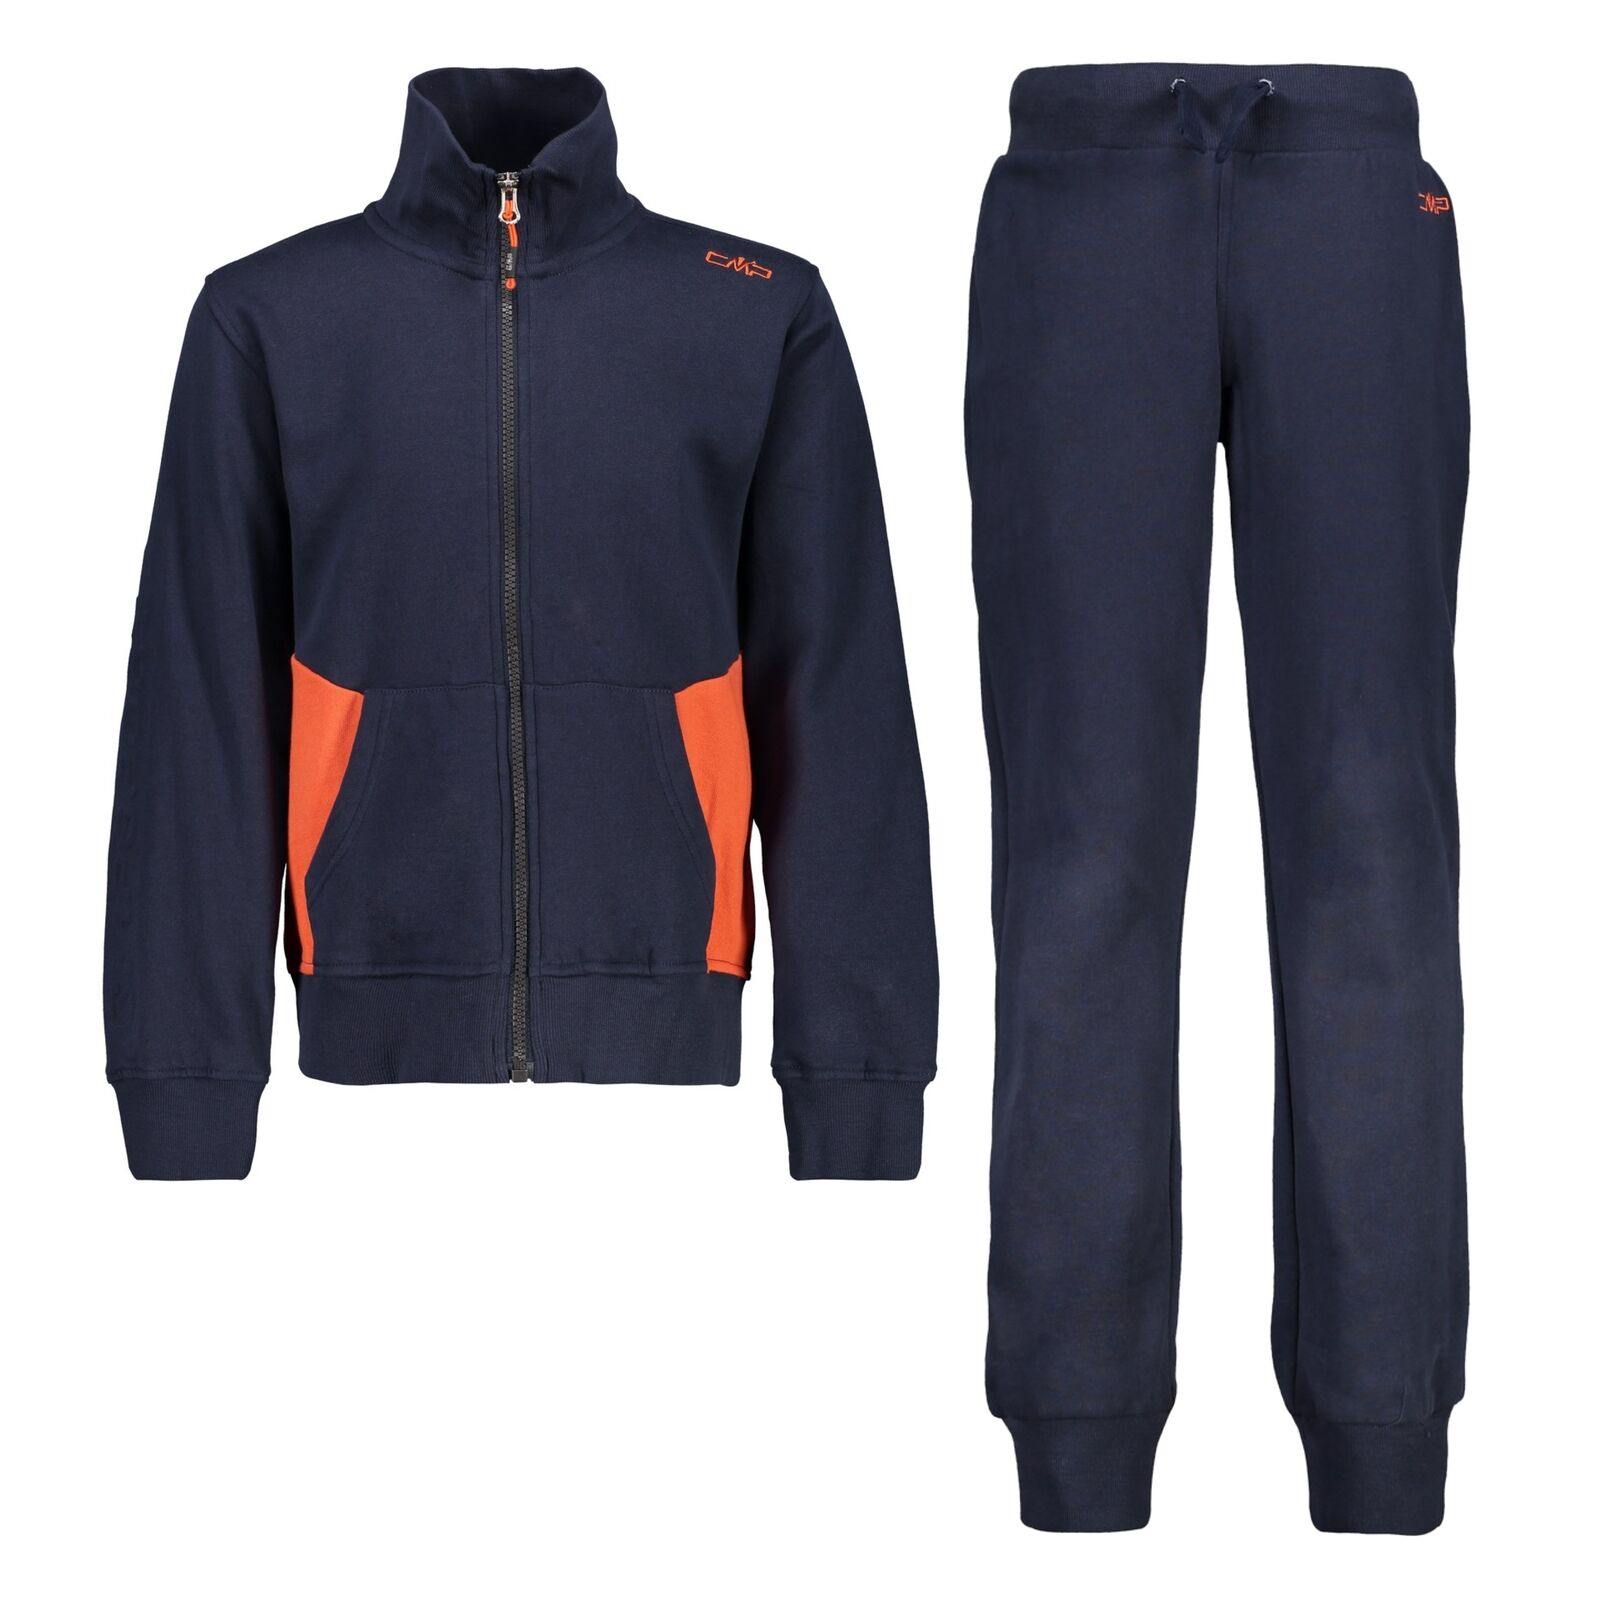 CMP  Survêtement D'Entraînement Jogging Sweat bluee Sacs Col Droit  selling well all over the world